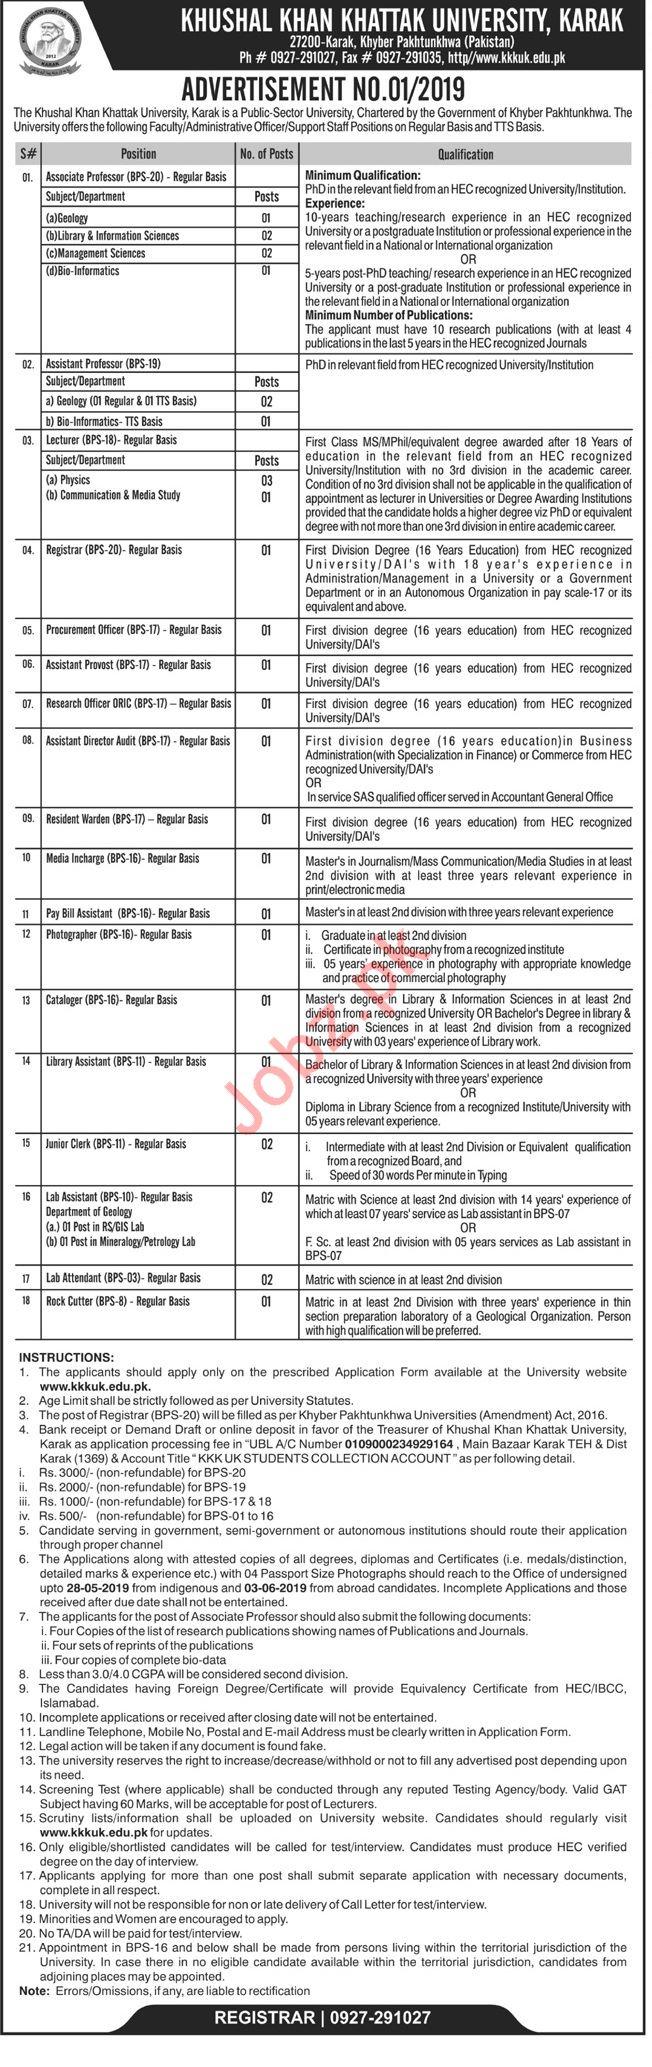 Khushal Khan Khattak University Jobs 2019